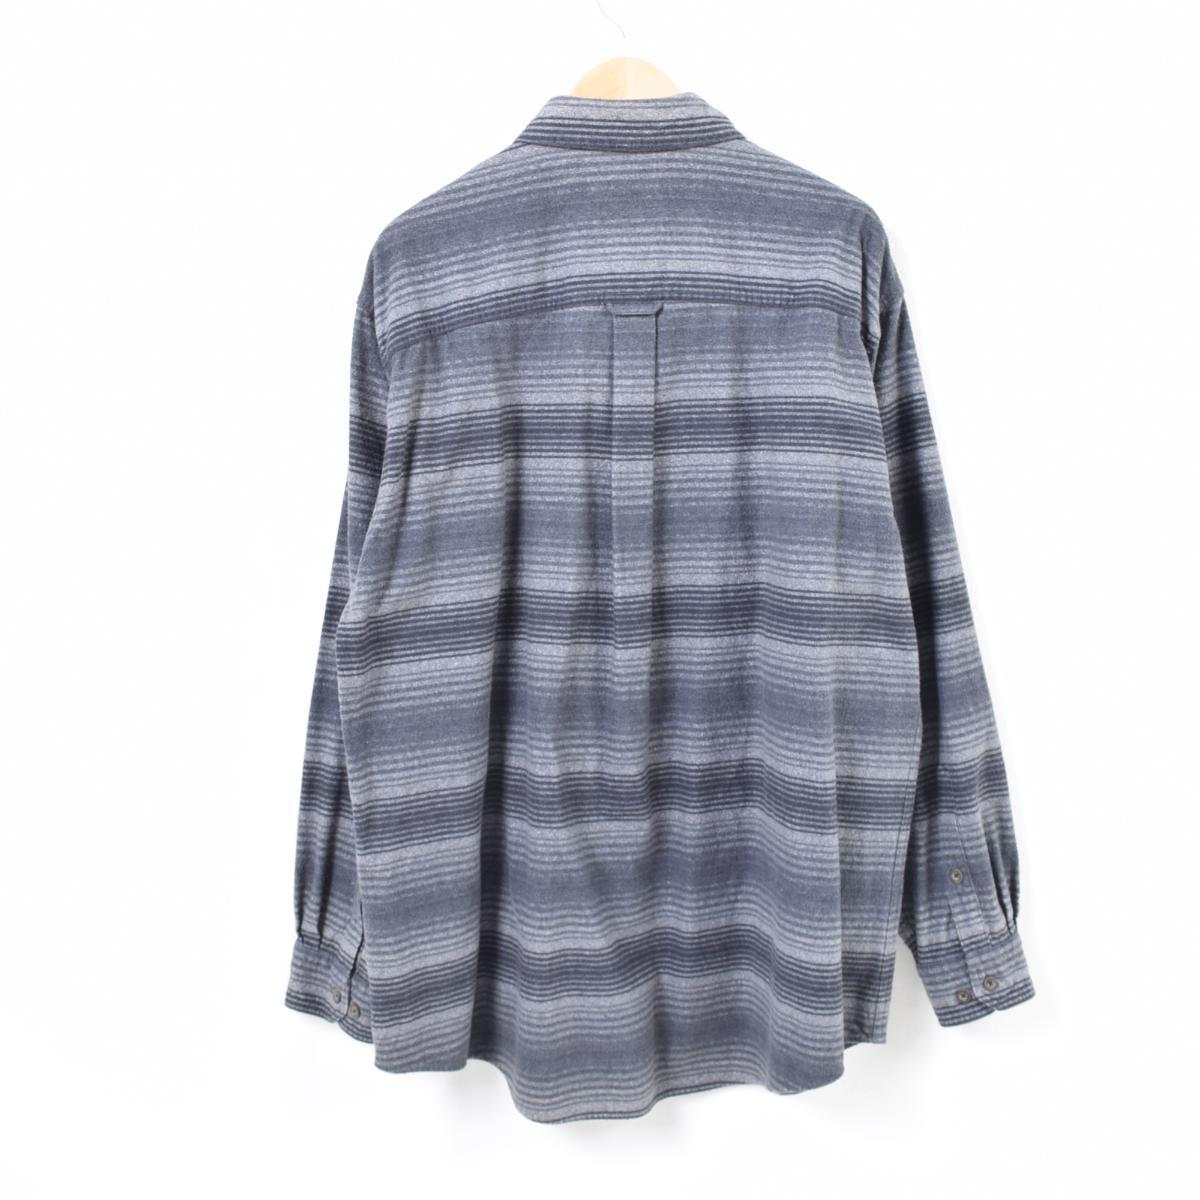 9925bc4d27 Ulrich WOOLRICH horizontal stripes long sleeves button-down shirt men XXL  /waq7009